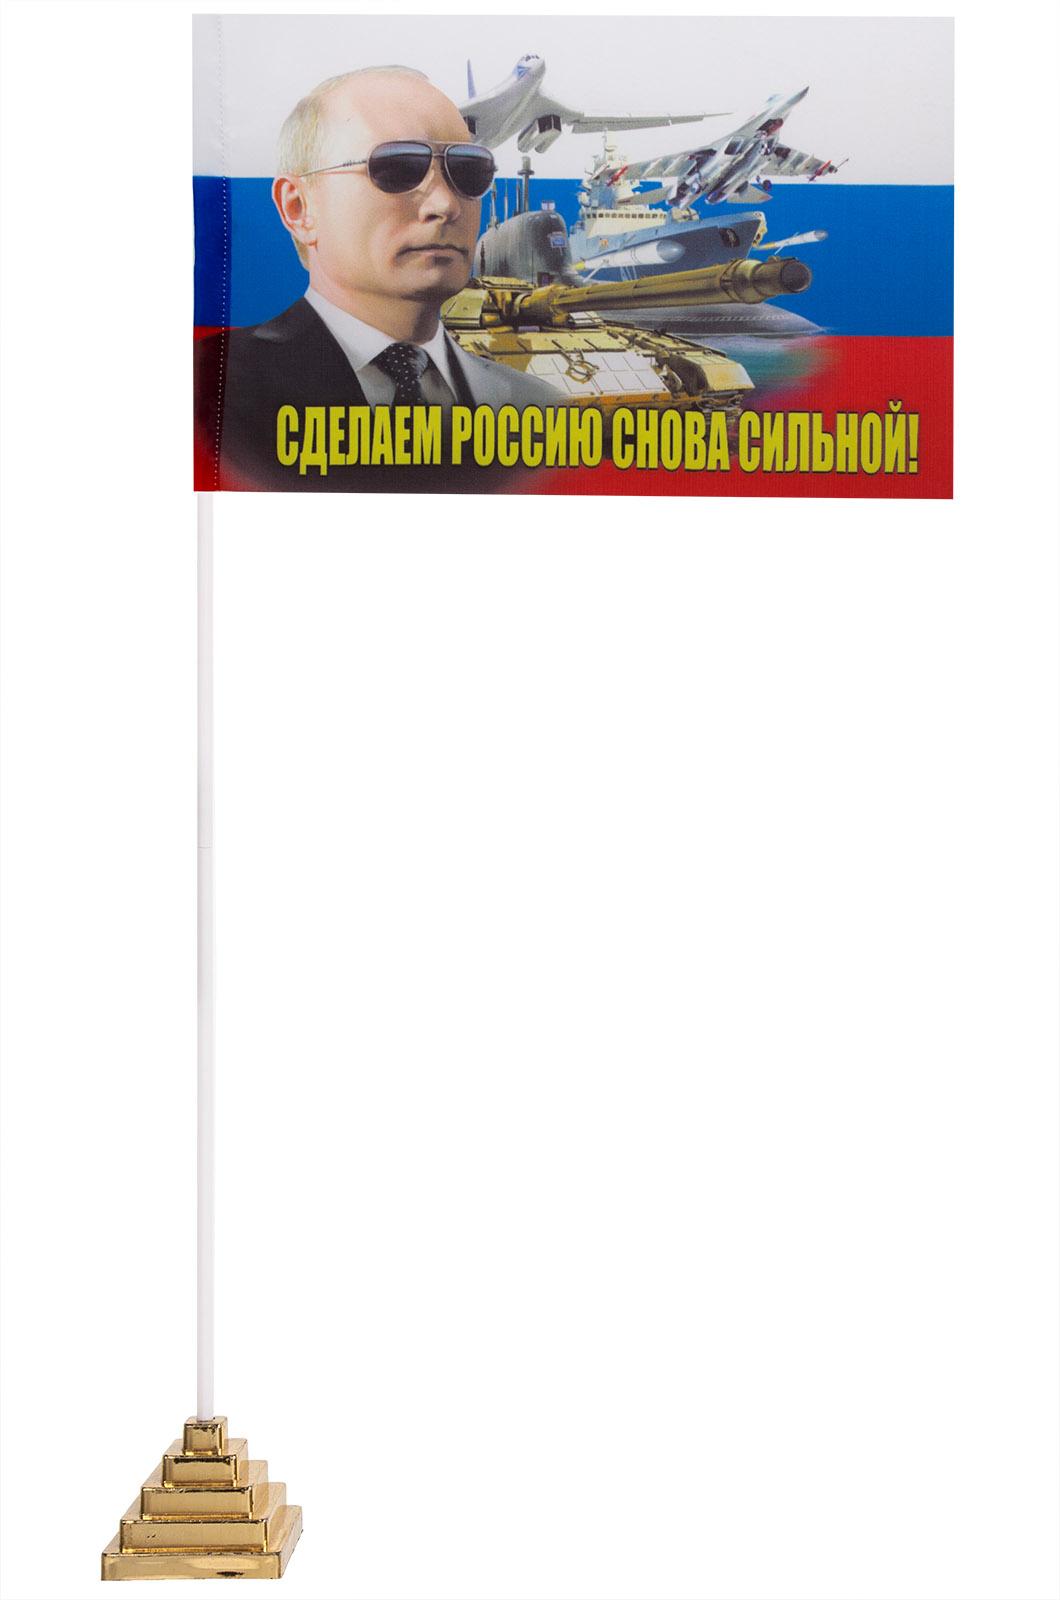 Флажок с Путиным